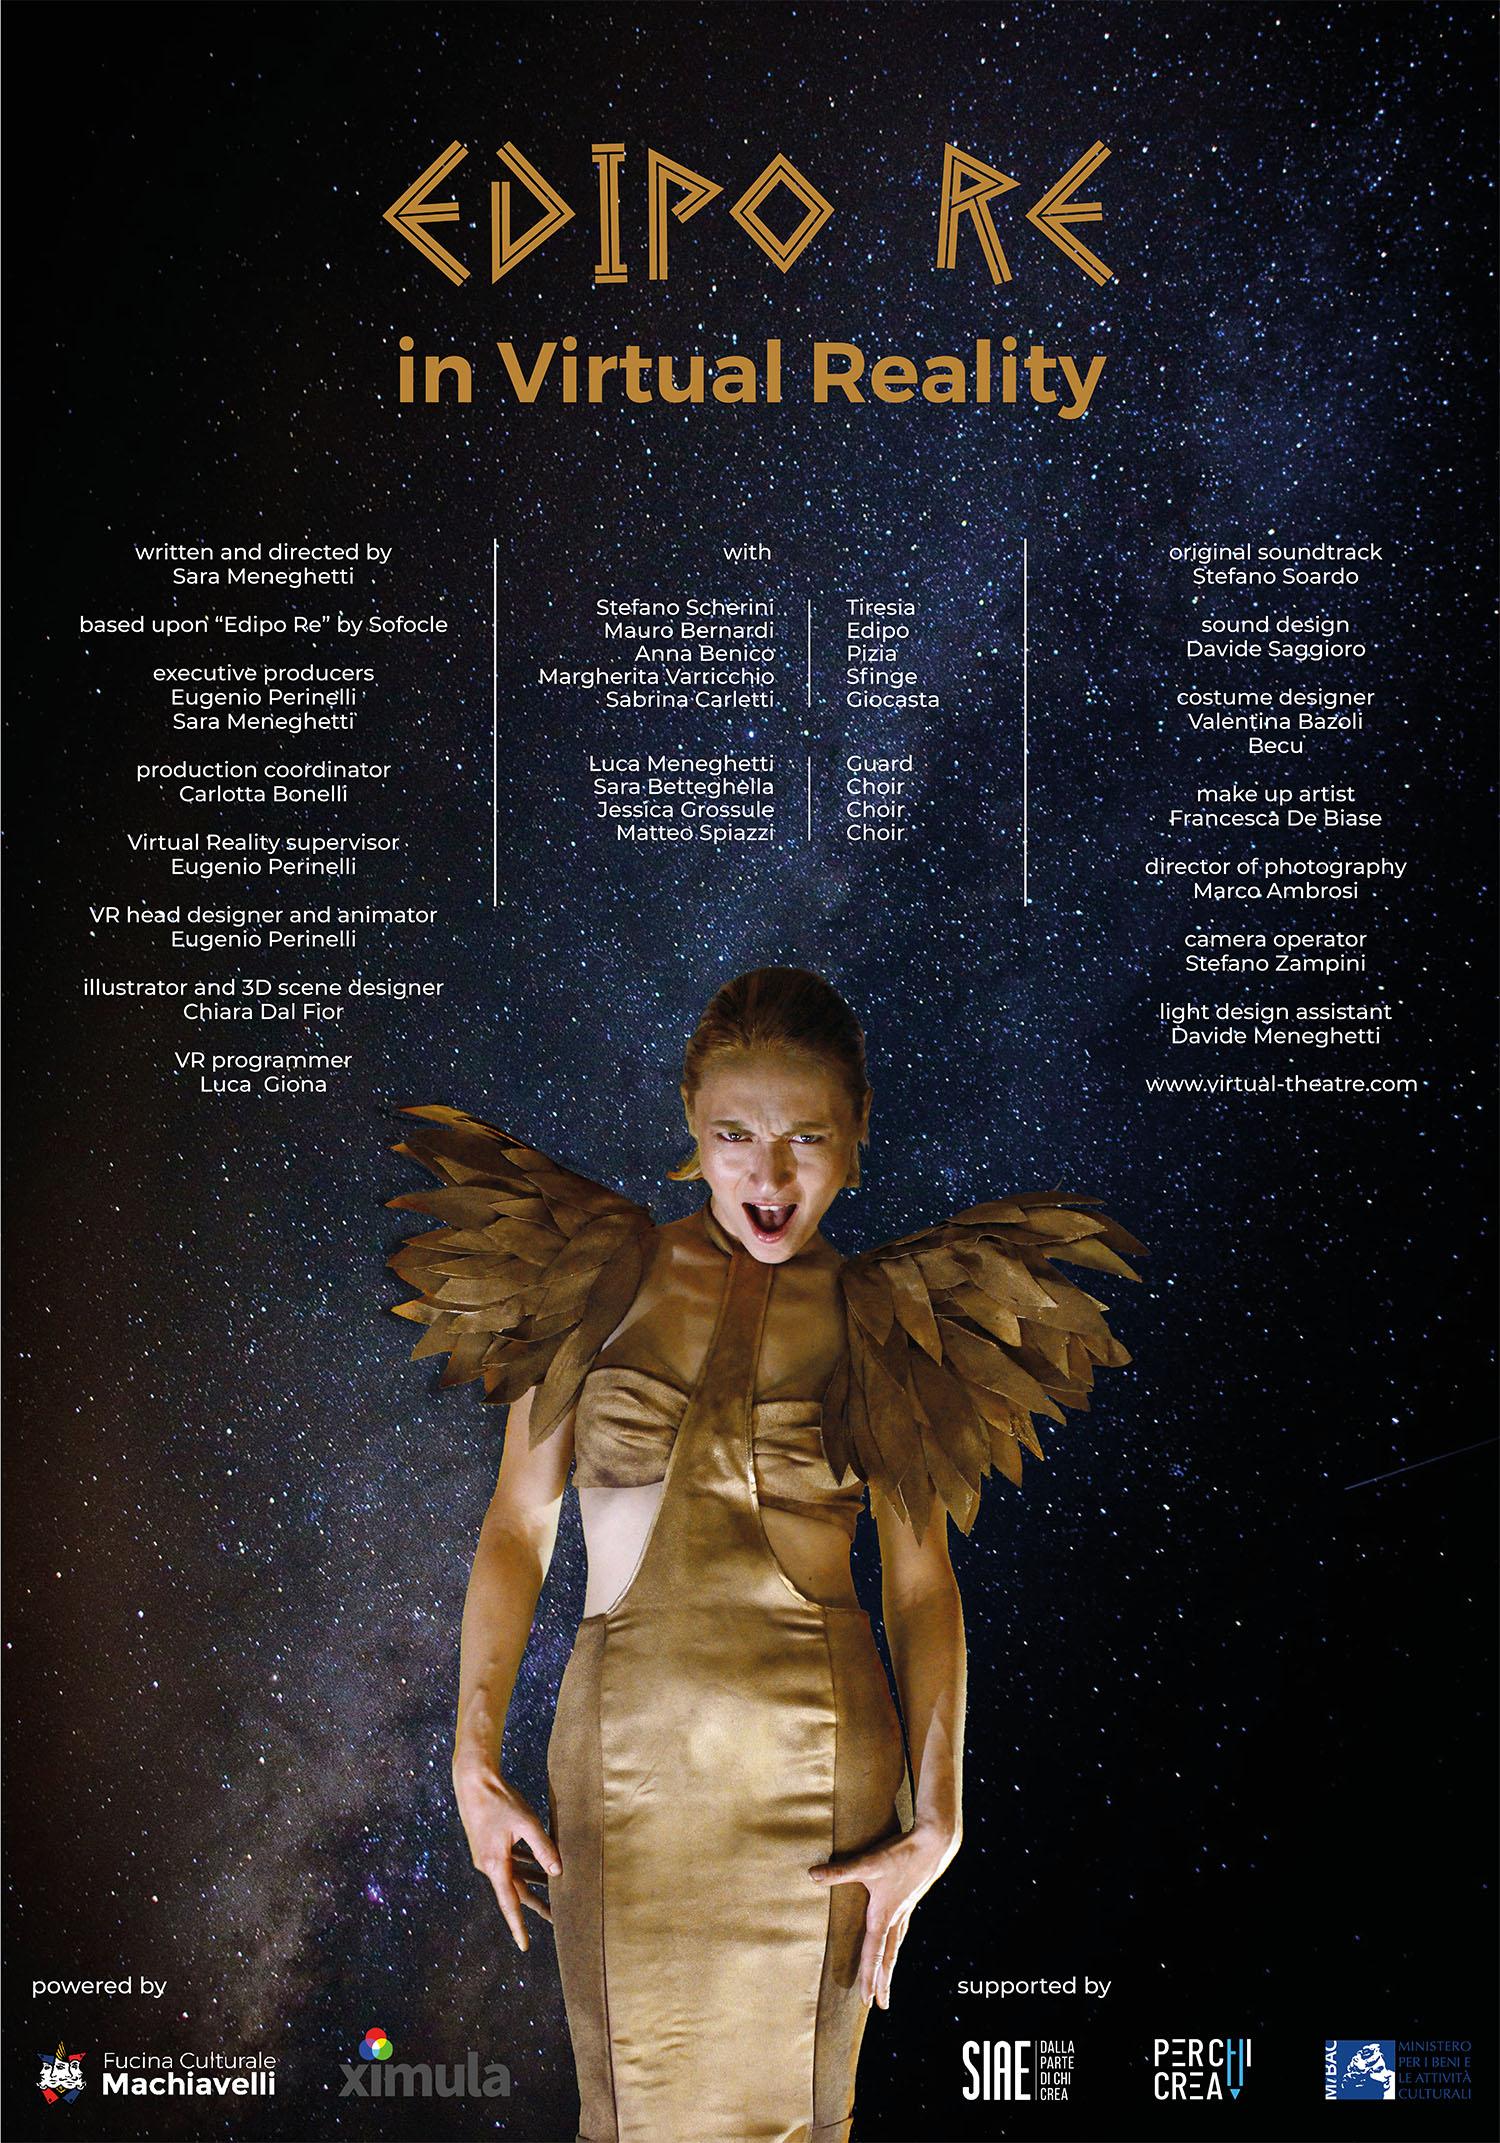 Edipo Re in Virtual Reality poster-Fucina Culturale Machiavelli